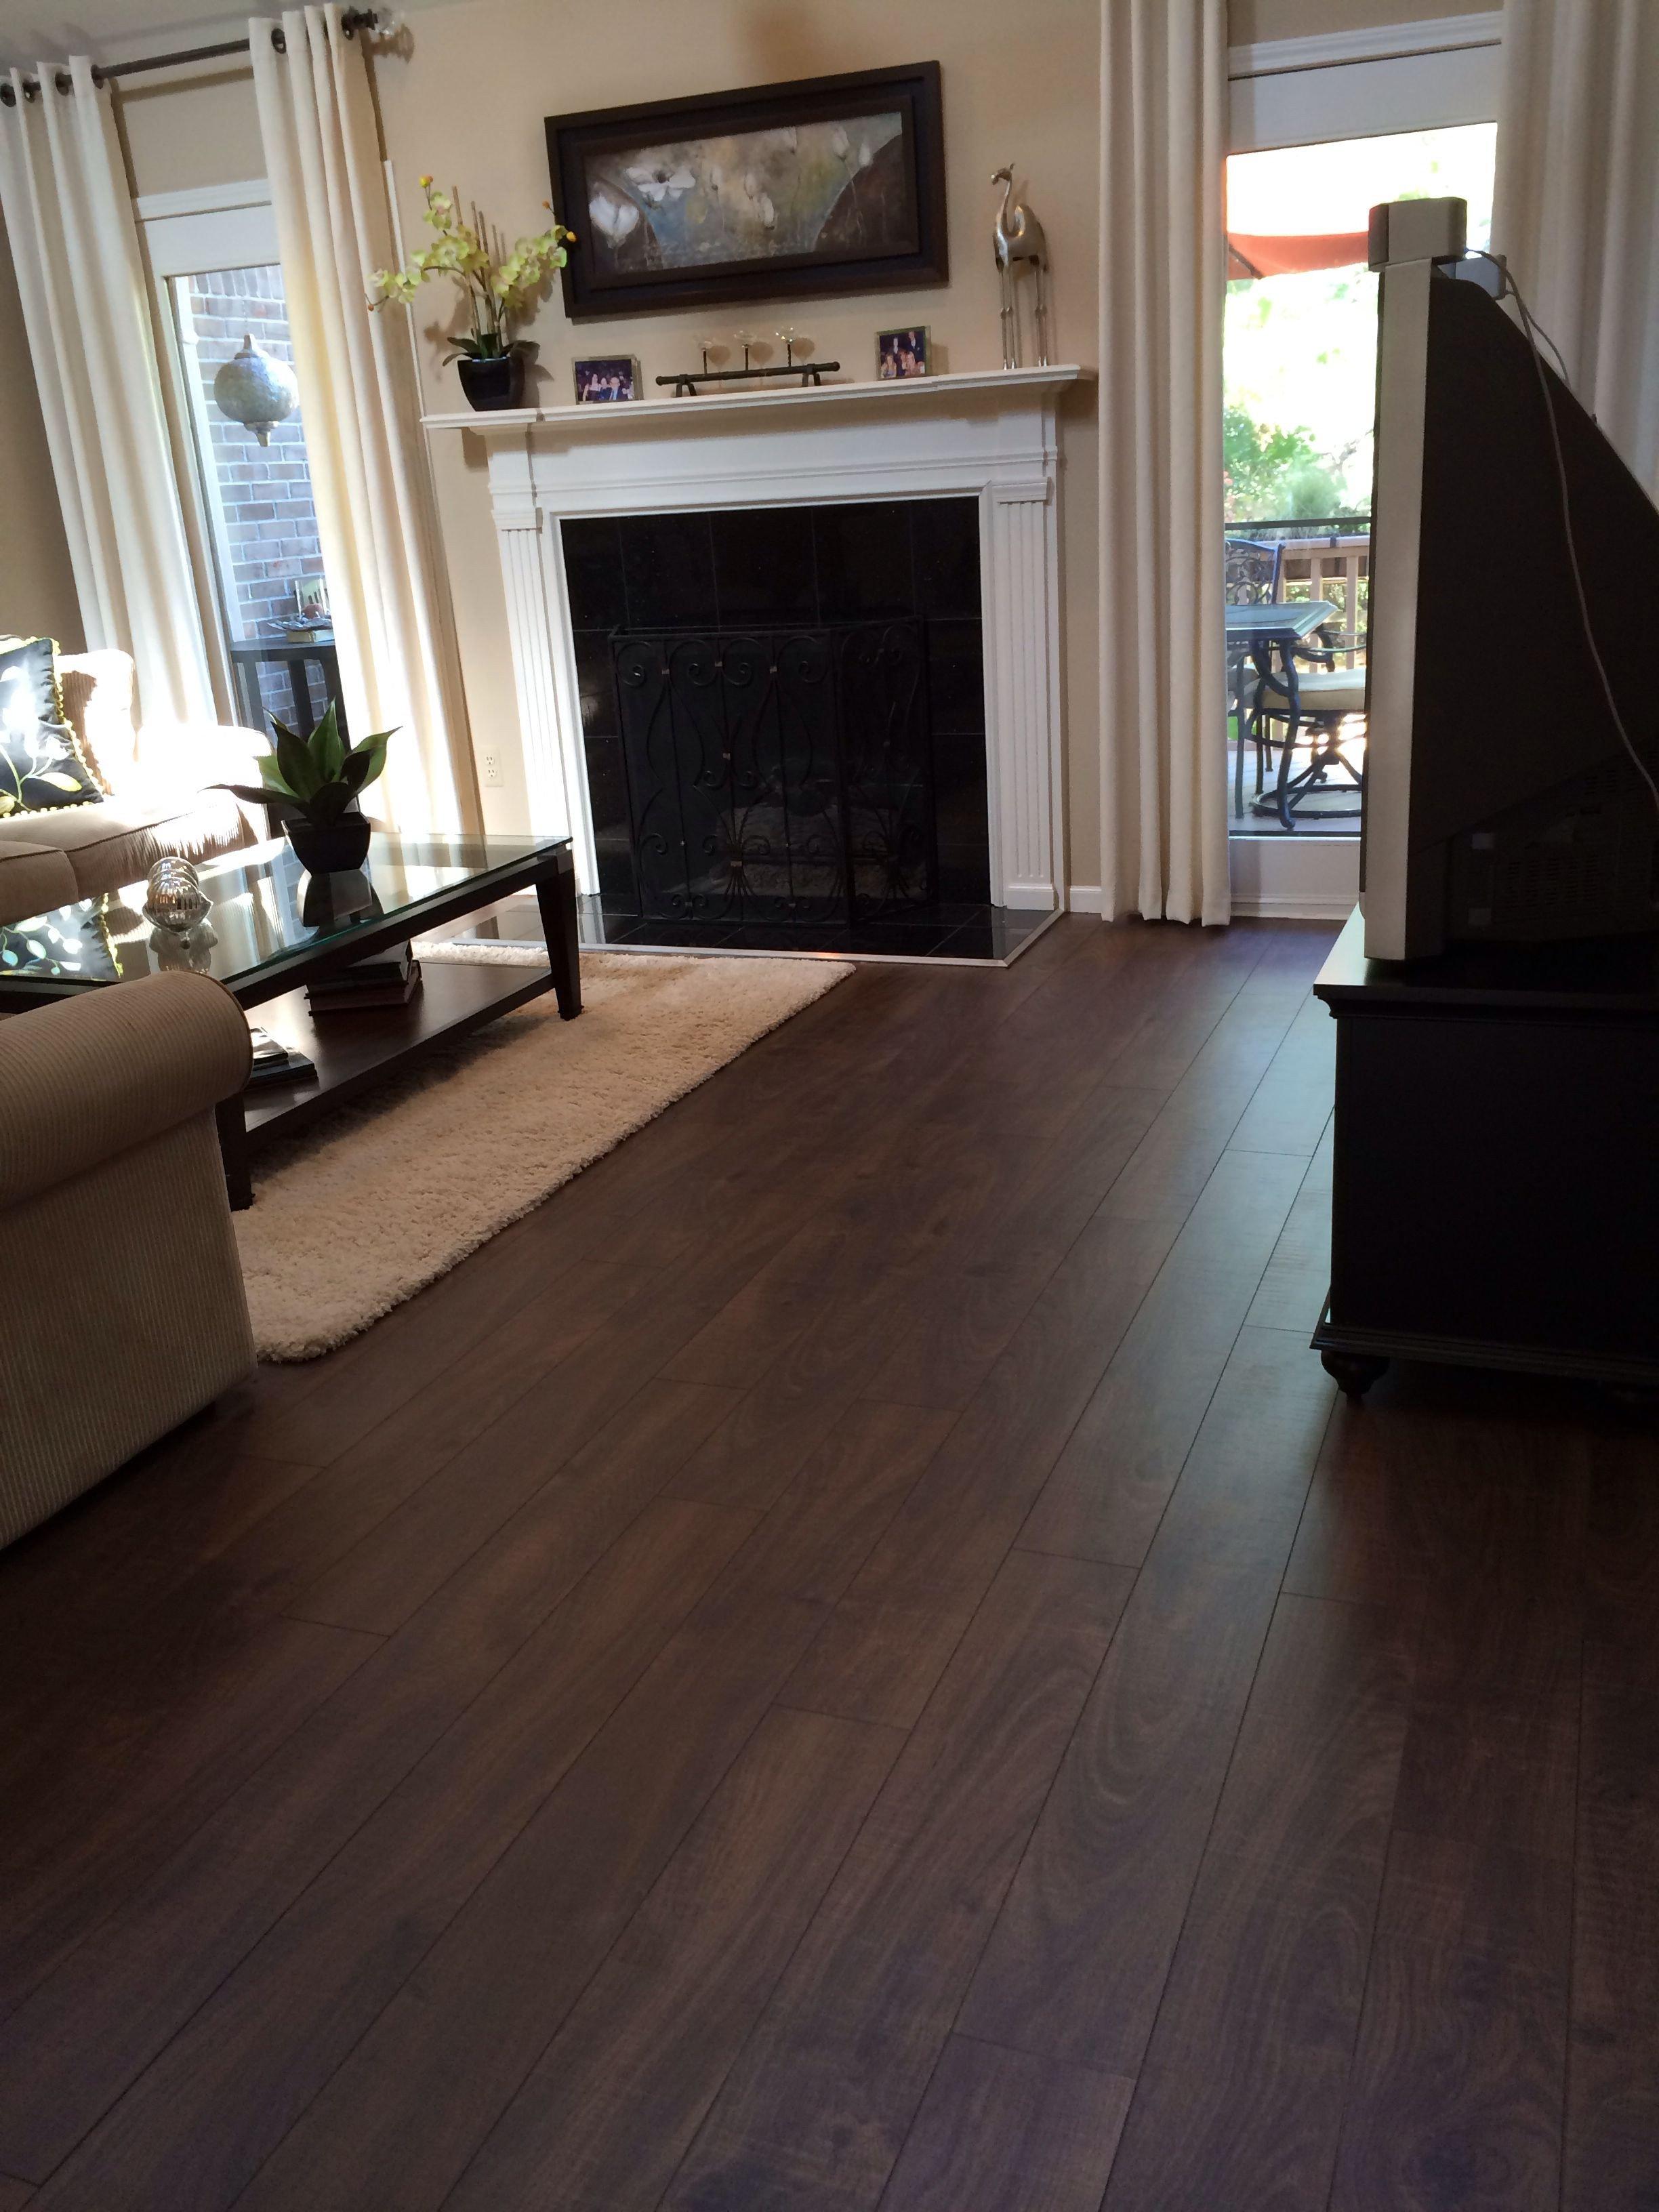 Dark Wood Floor Bedroom New Pin by Liliana Legarreta On Floors and Stairs